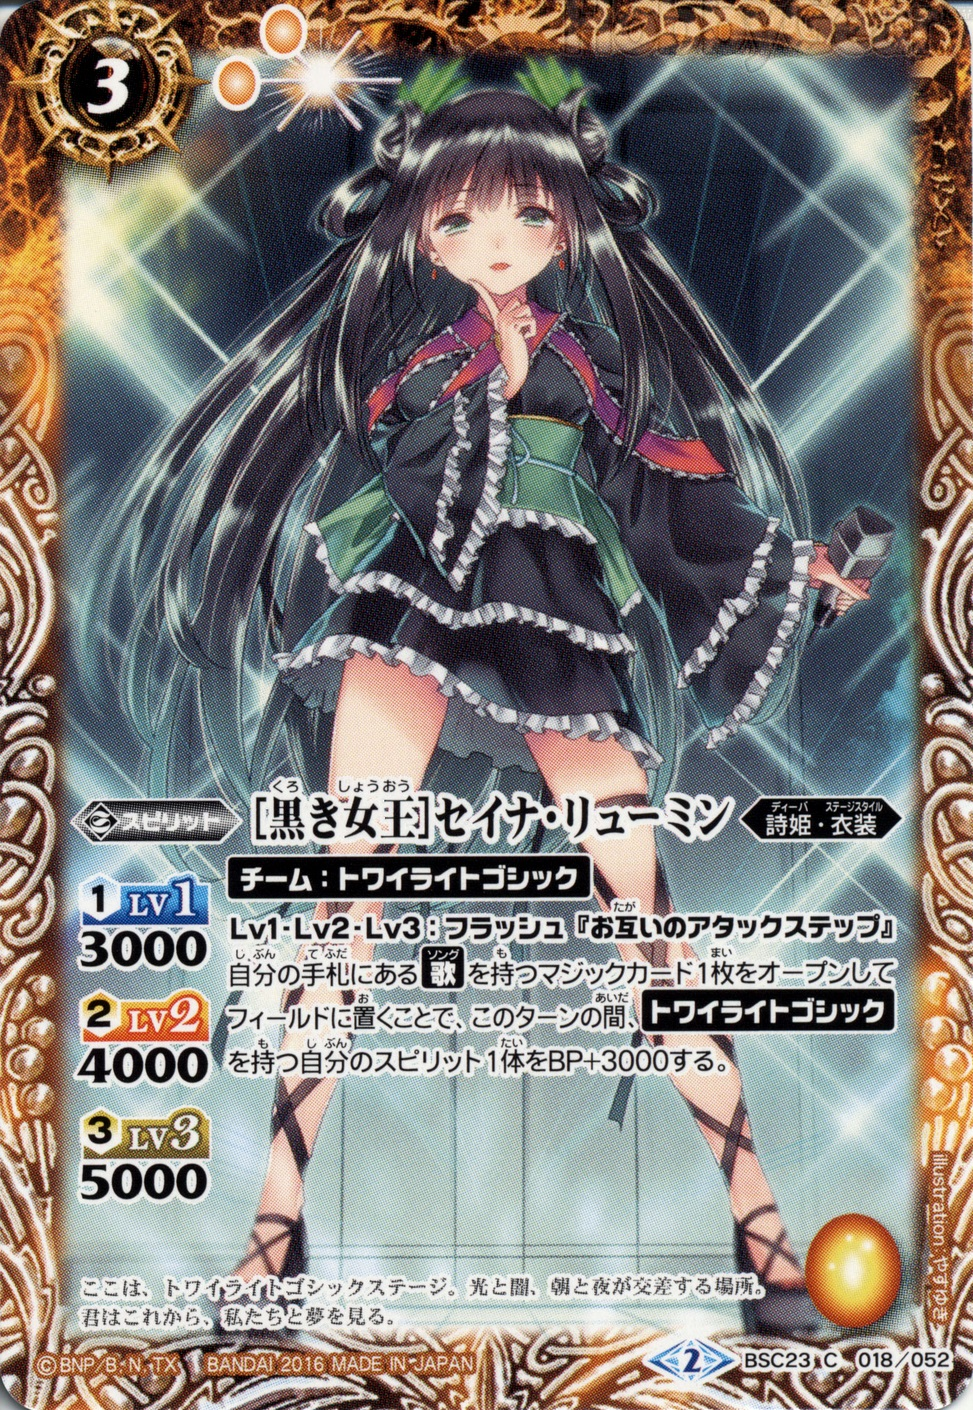 [Black Queen]Seina-Ryumin